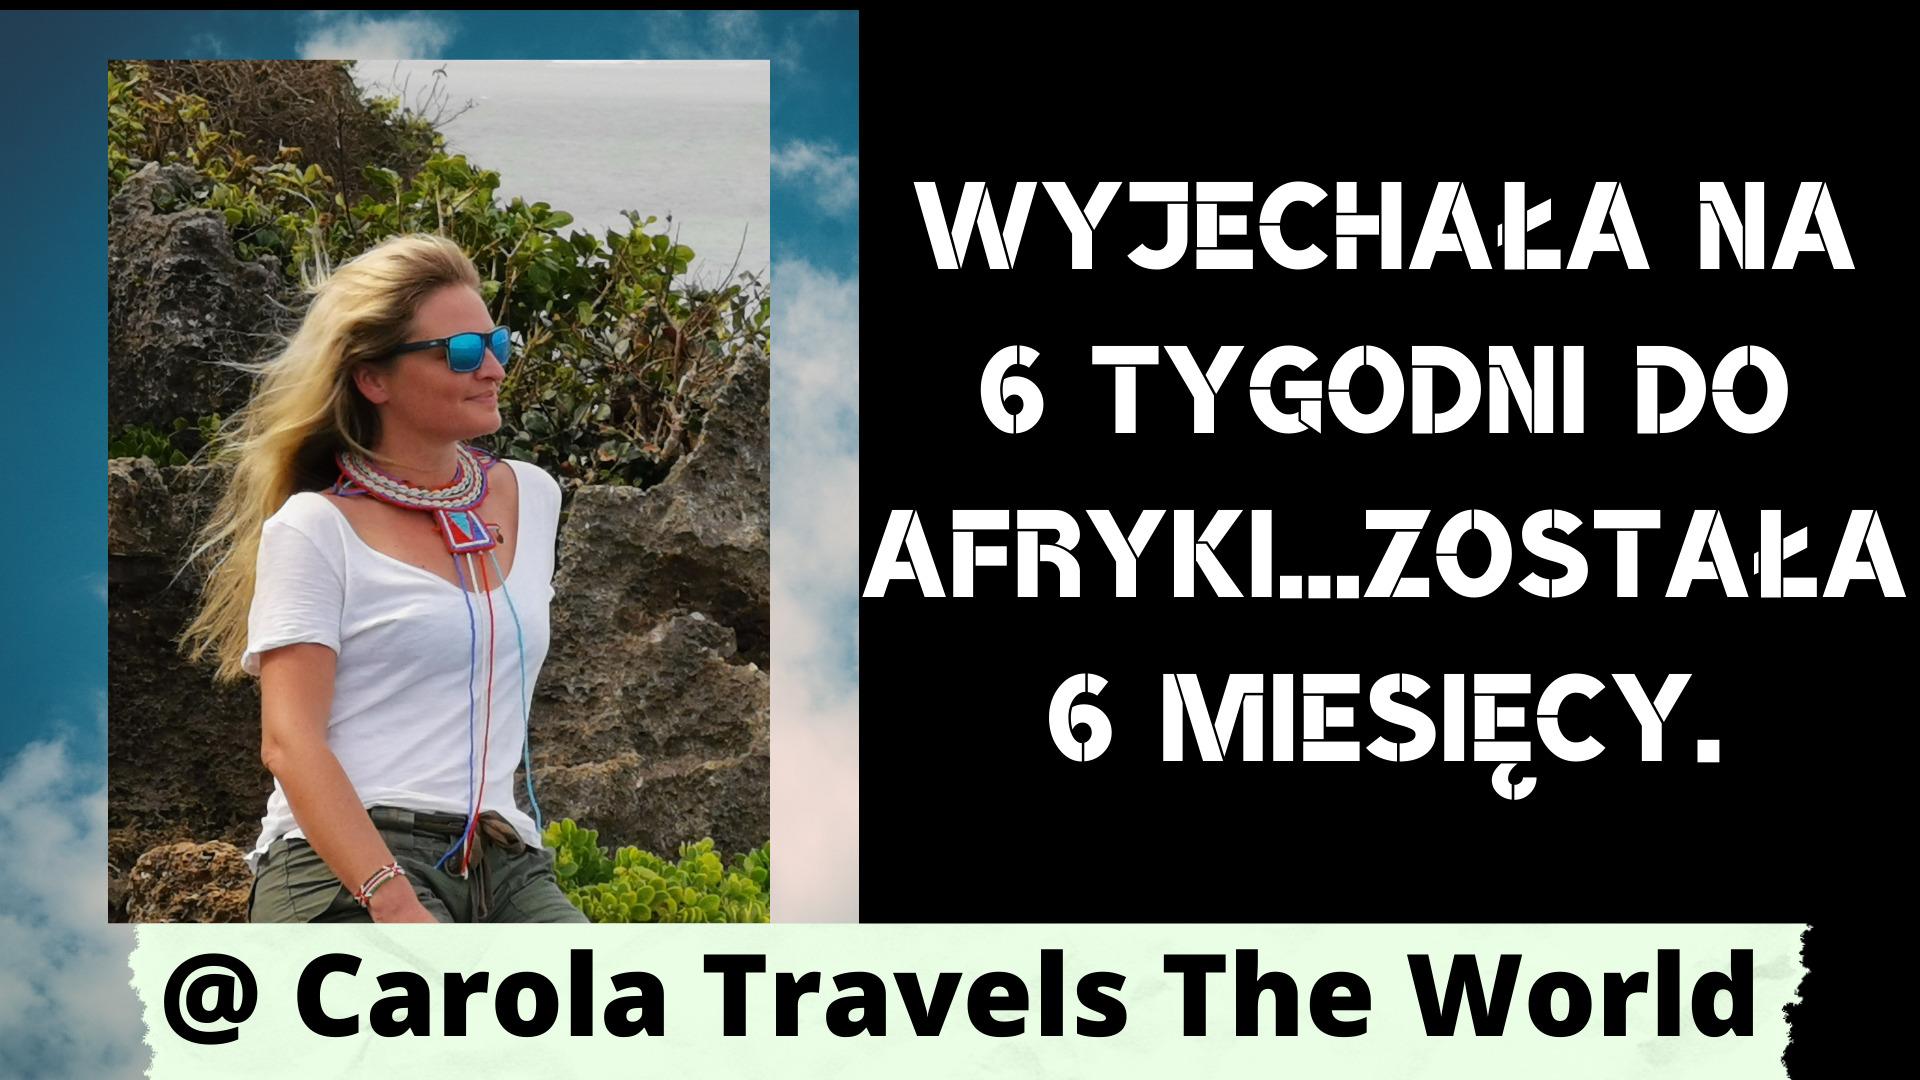 Carola Travels The World (1)